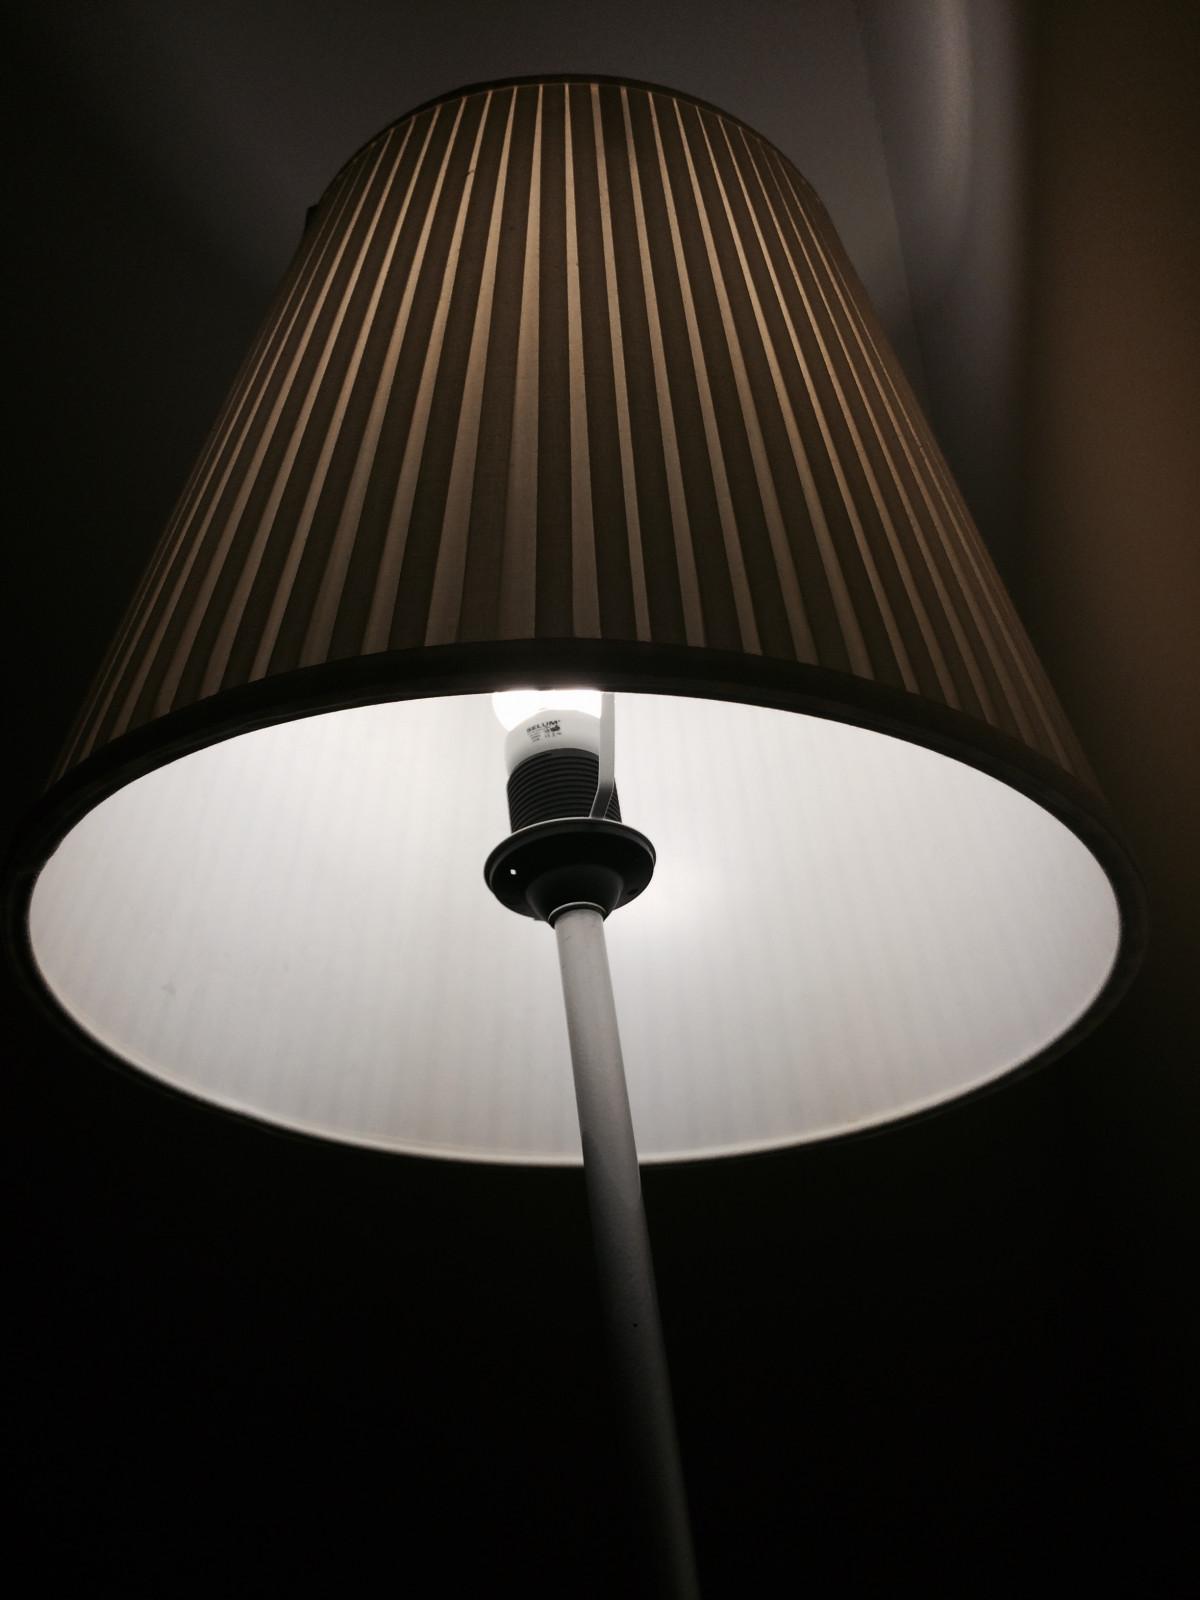 decke abdeckung lampe baldachin decke lampe leuchte abdeckung kappe kabel ddr abdeckung lampe. Black Bedroom Furniture Sets. Home Design Ideas